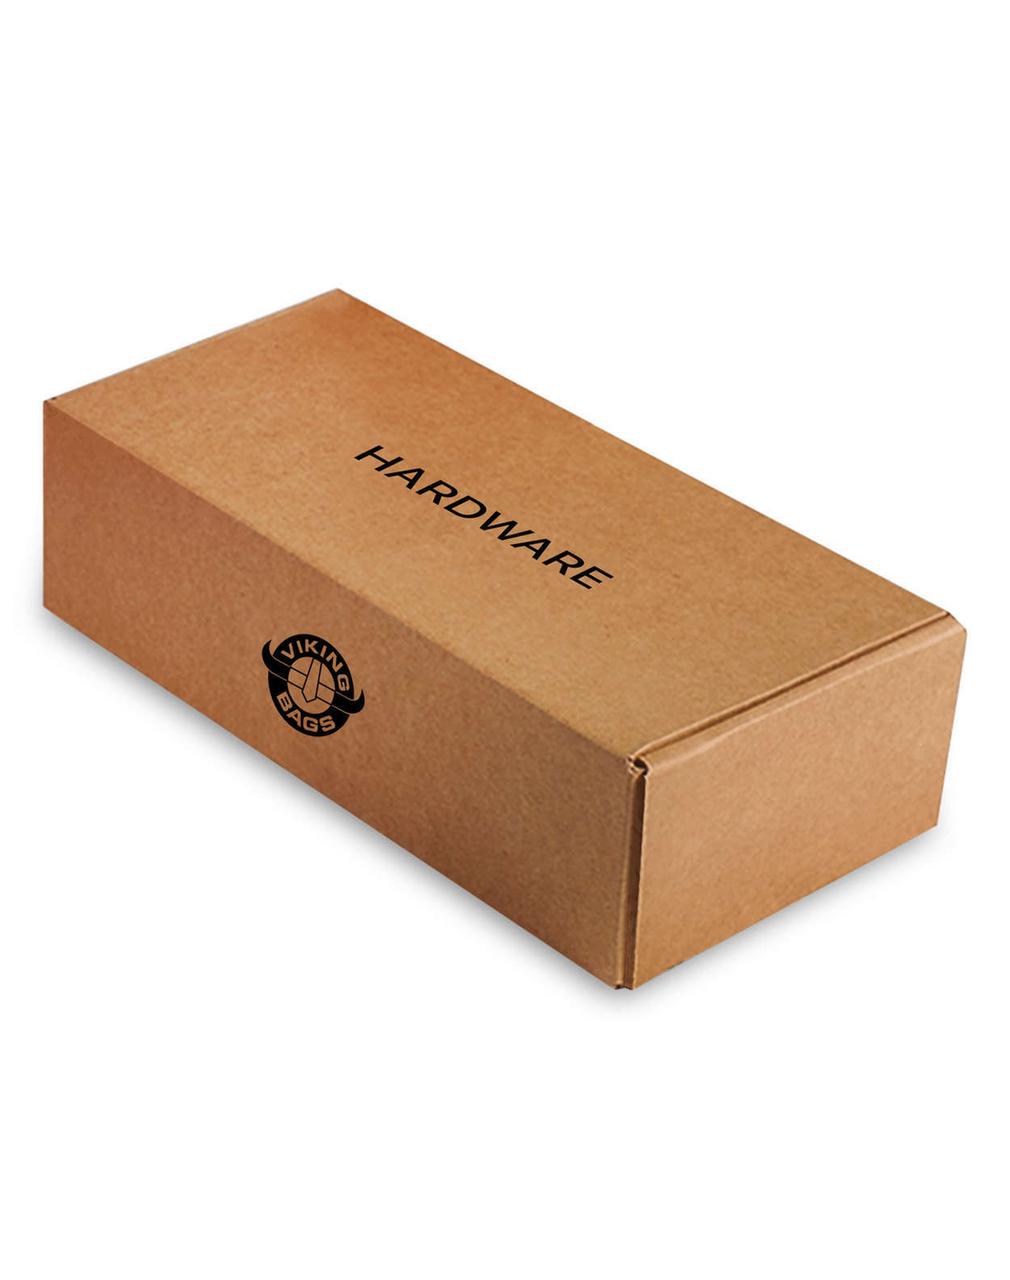 Honda 1500 Valkyrie Standard Uni Slanted Studded L Motorcycle saddlebags Box